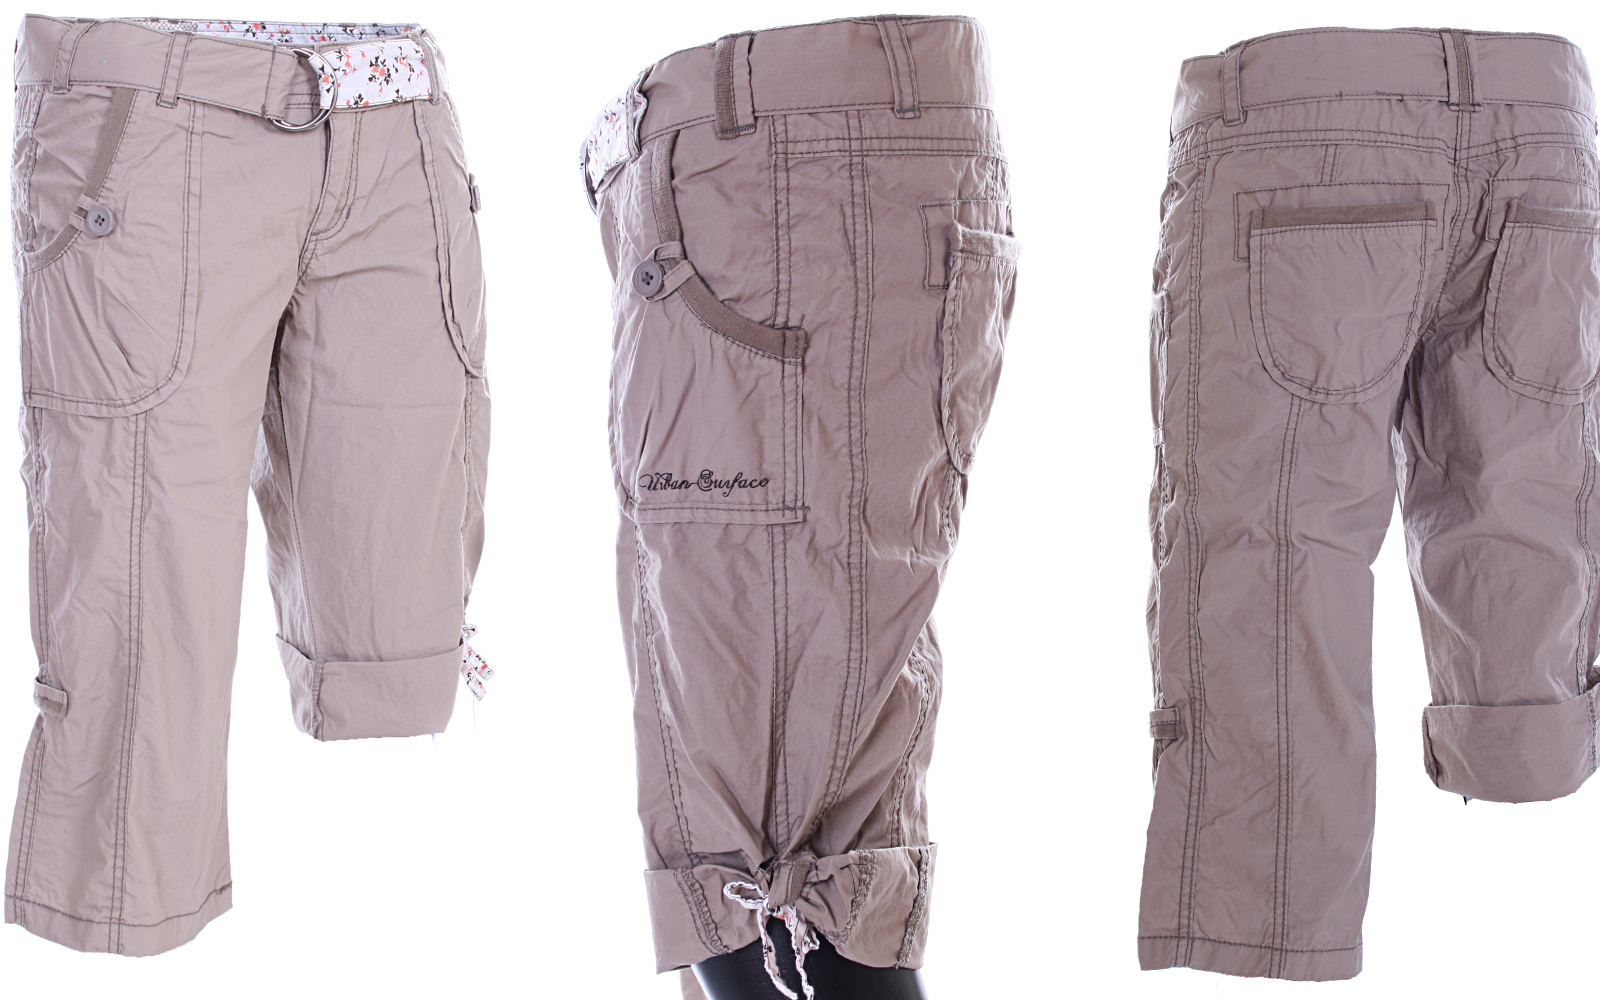 neu damen 2 in 1 cargo hose capri bermuda shorts schwarz sand weiss xs s m l xl ebay. Black Bedroom Furniture Sets. Home Design Ideas